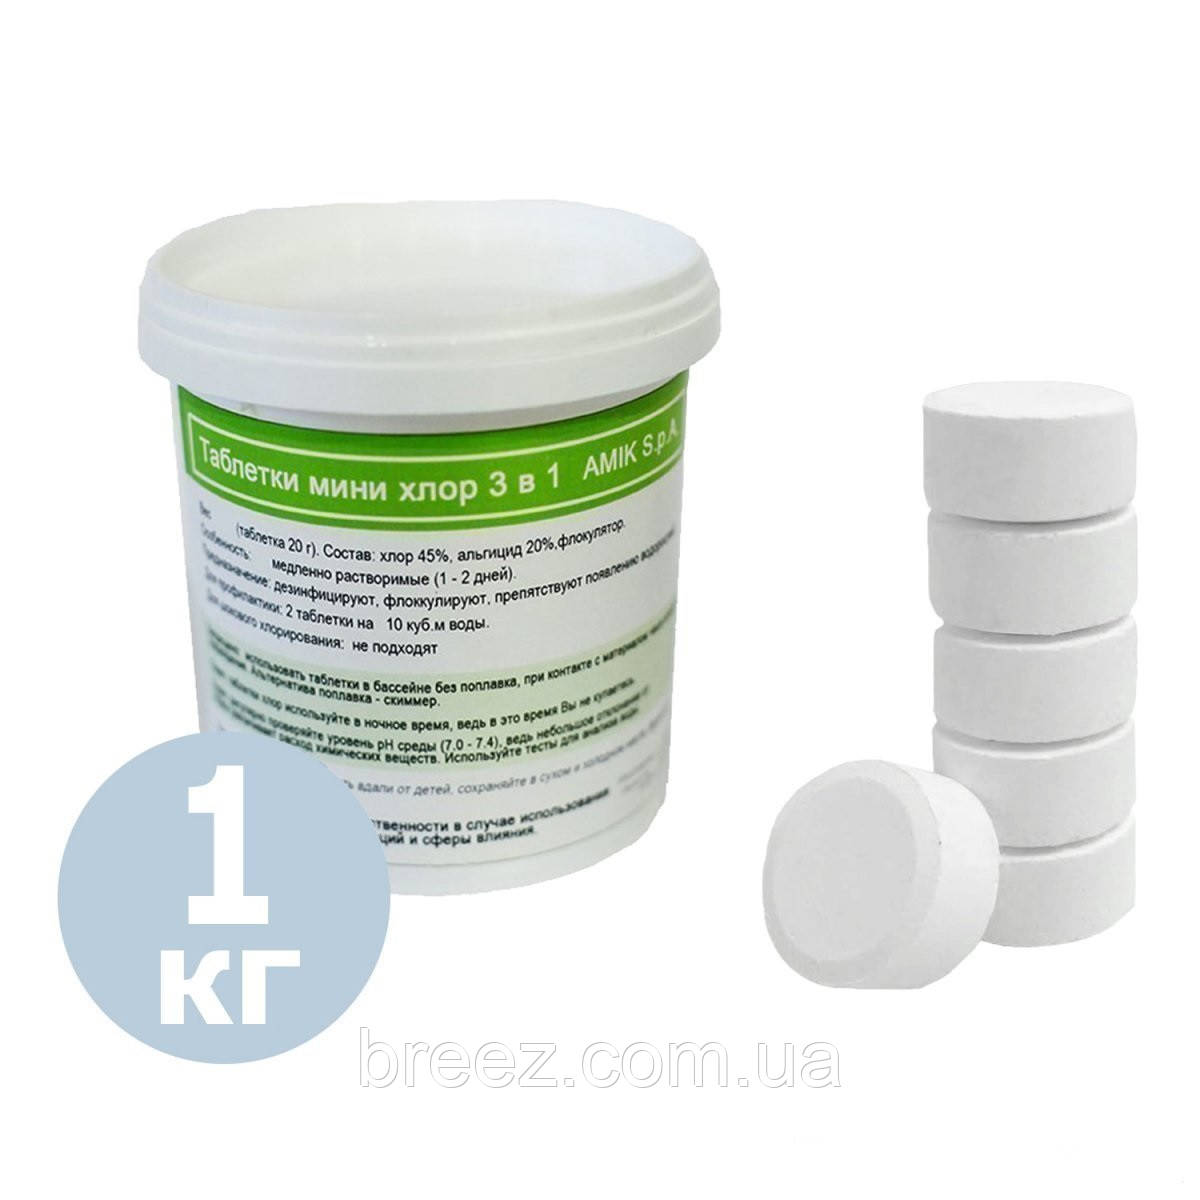 Таблетки для бассейна MINI - хлор Amik S.p.A 80006 1 кг Италия